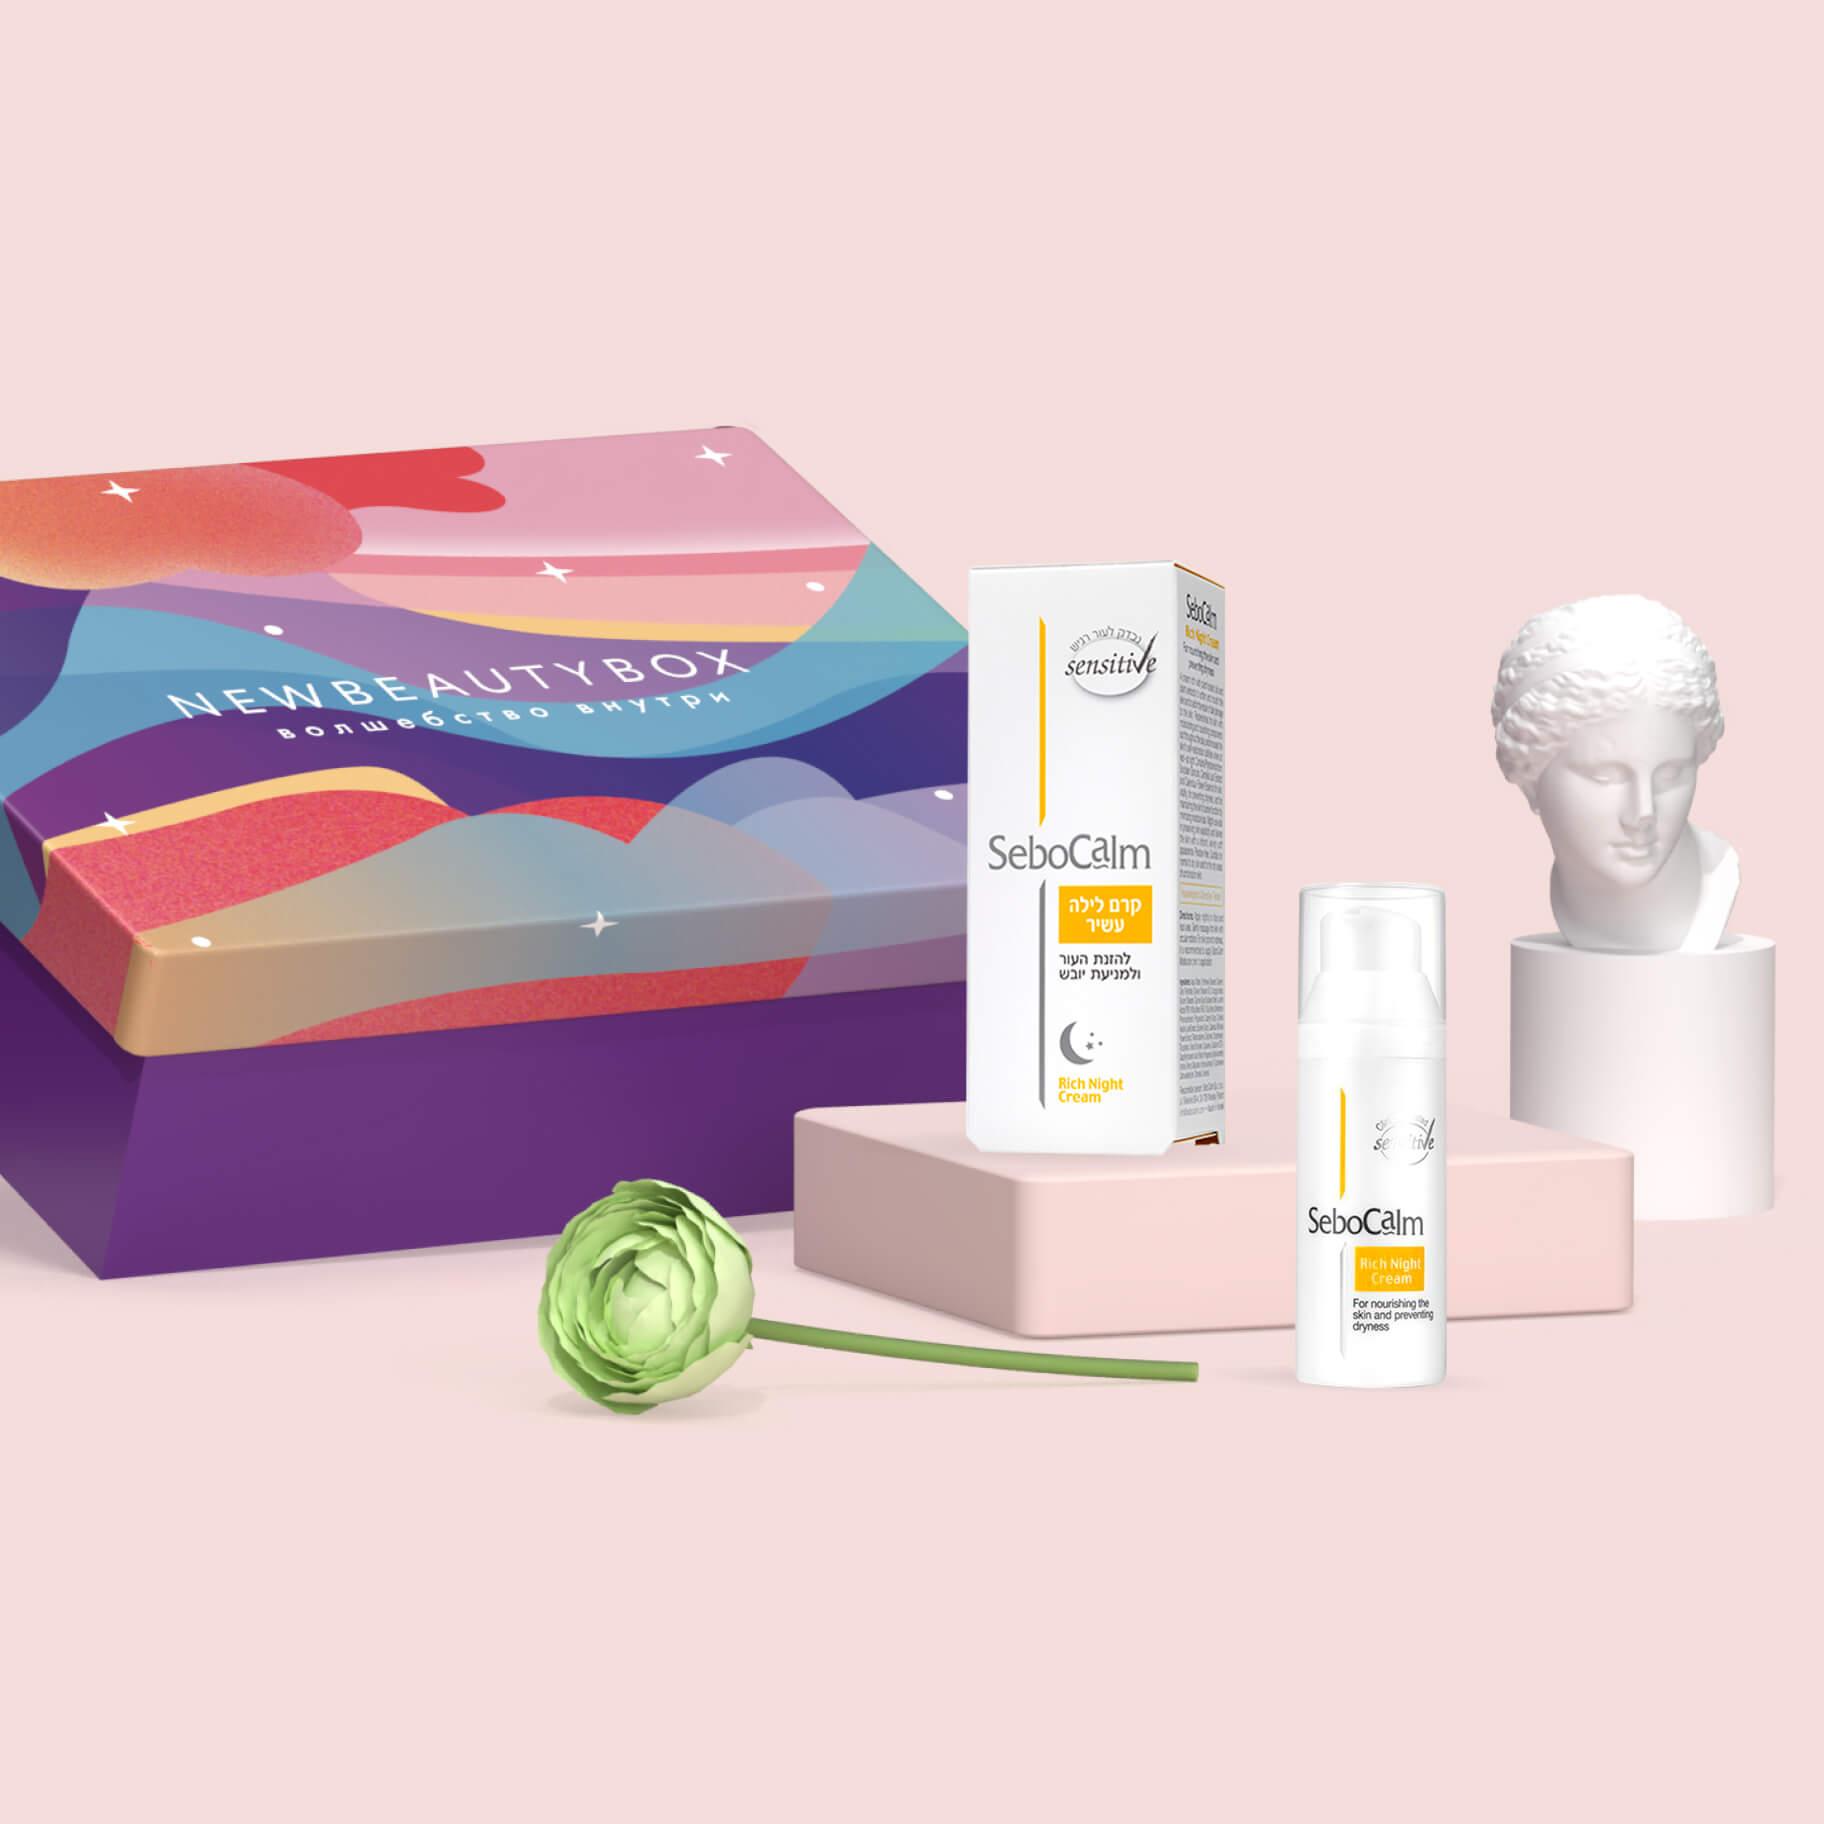 Dream Box Limited